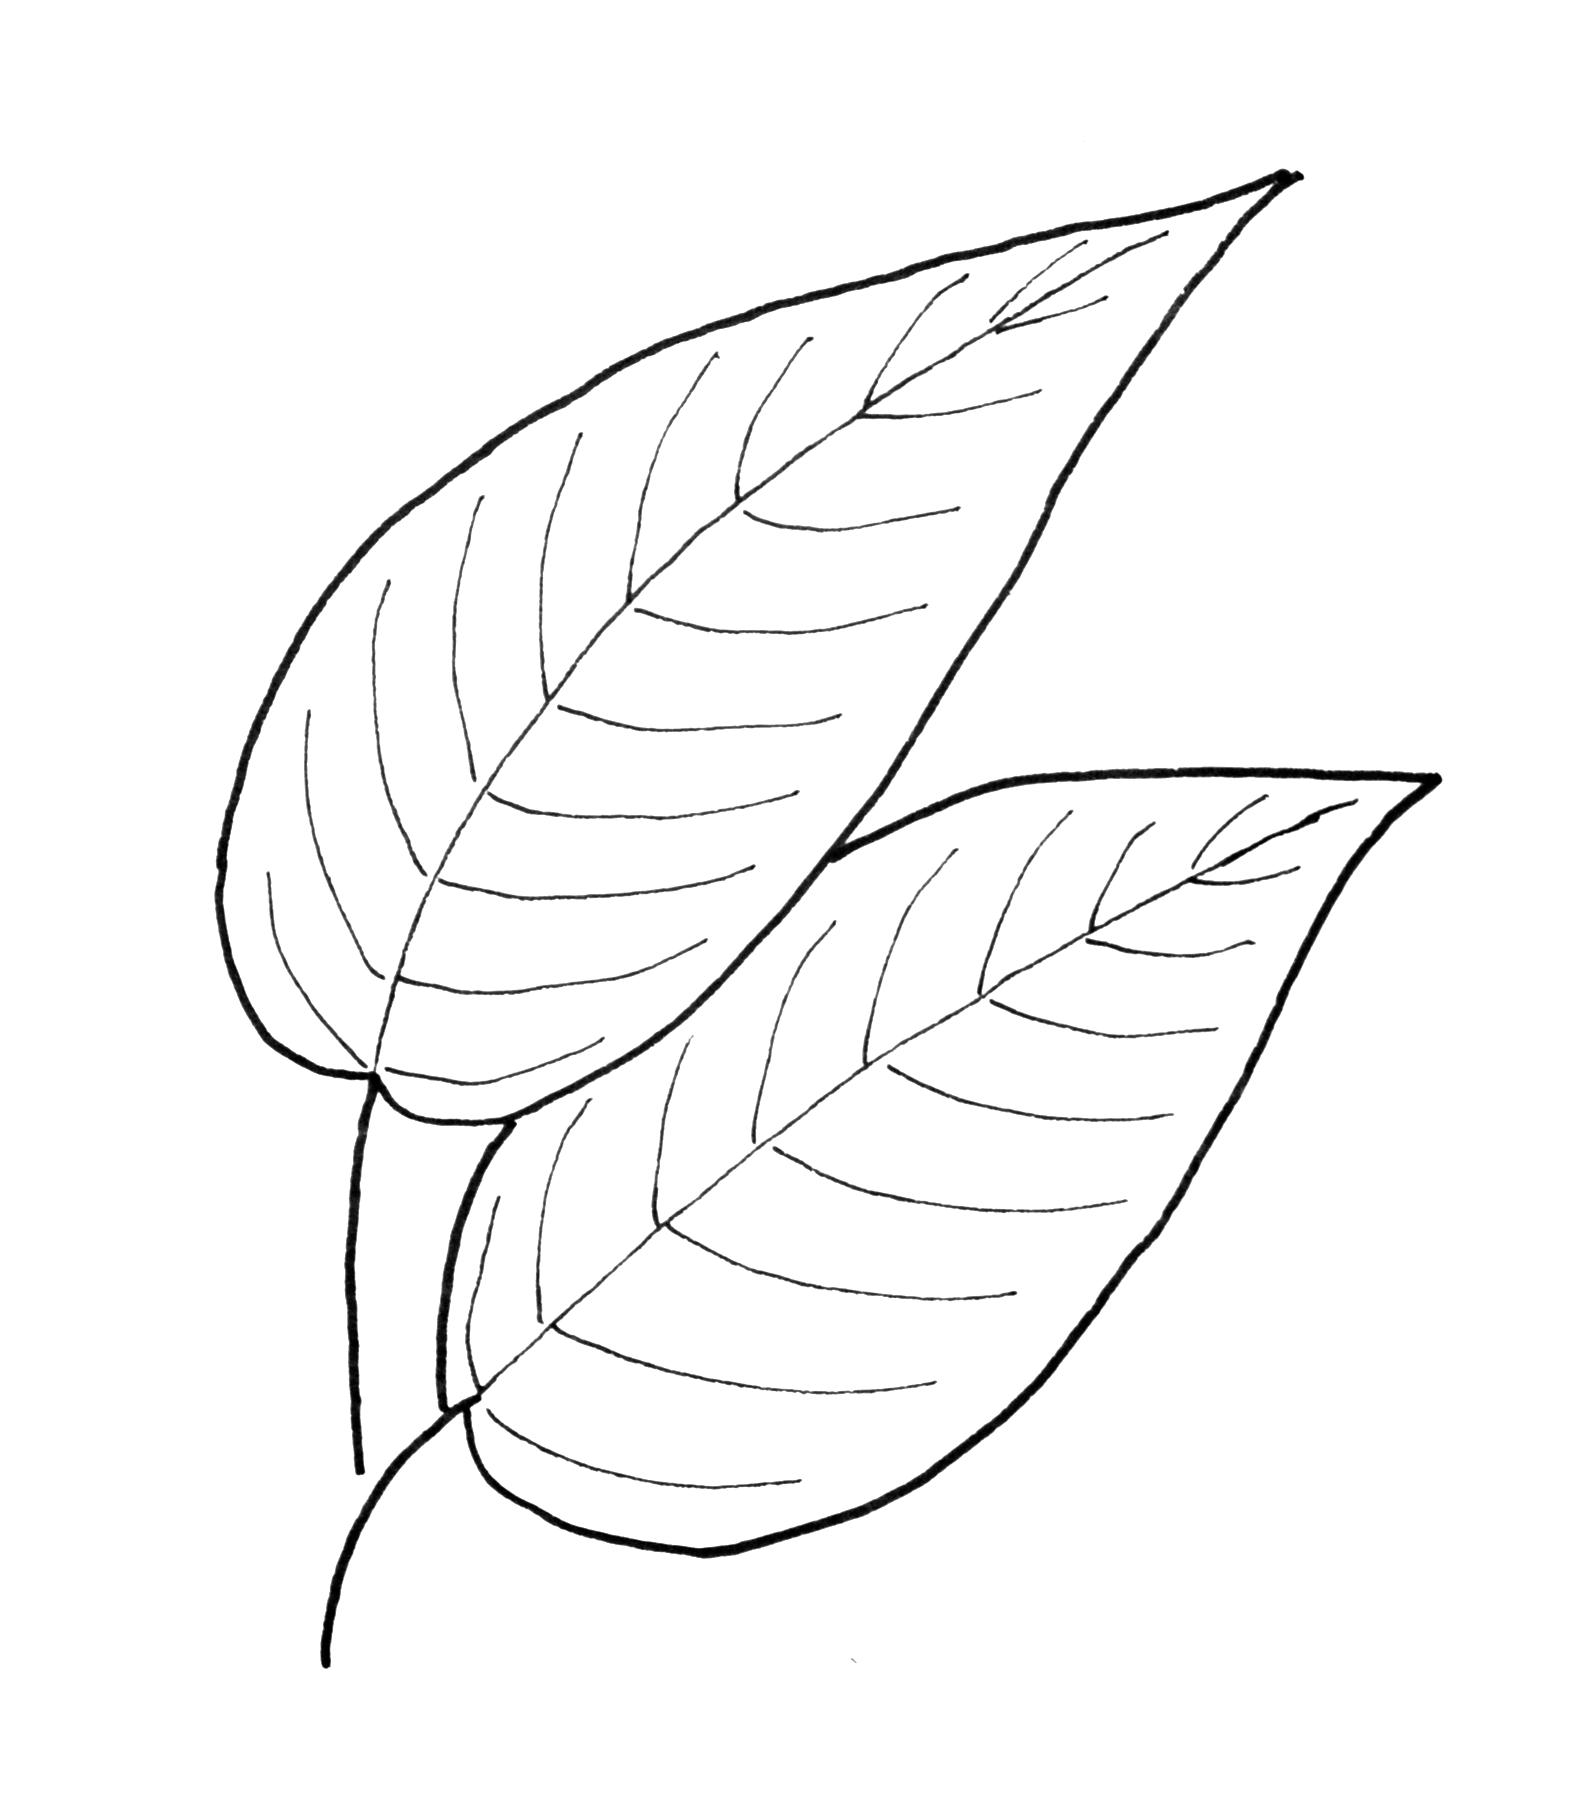 Autumn leaf cutouts templates clipart best - Fall Leaf Pattern Printables